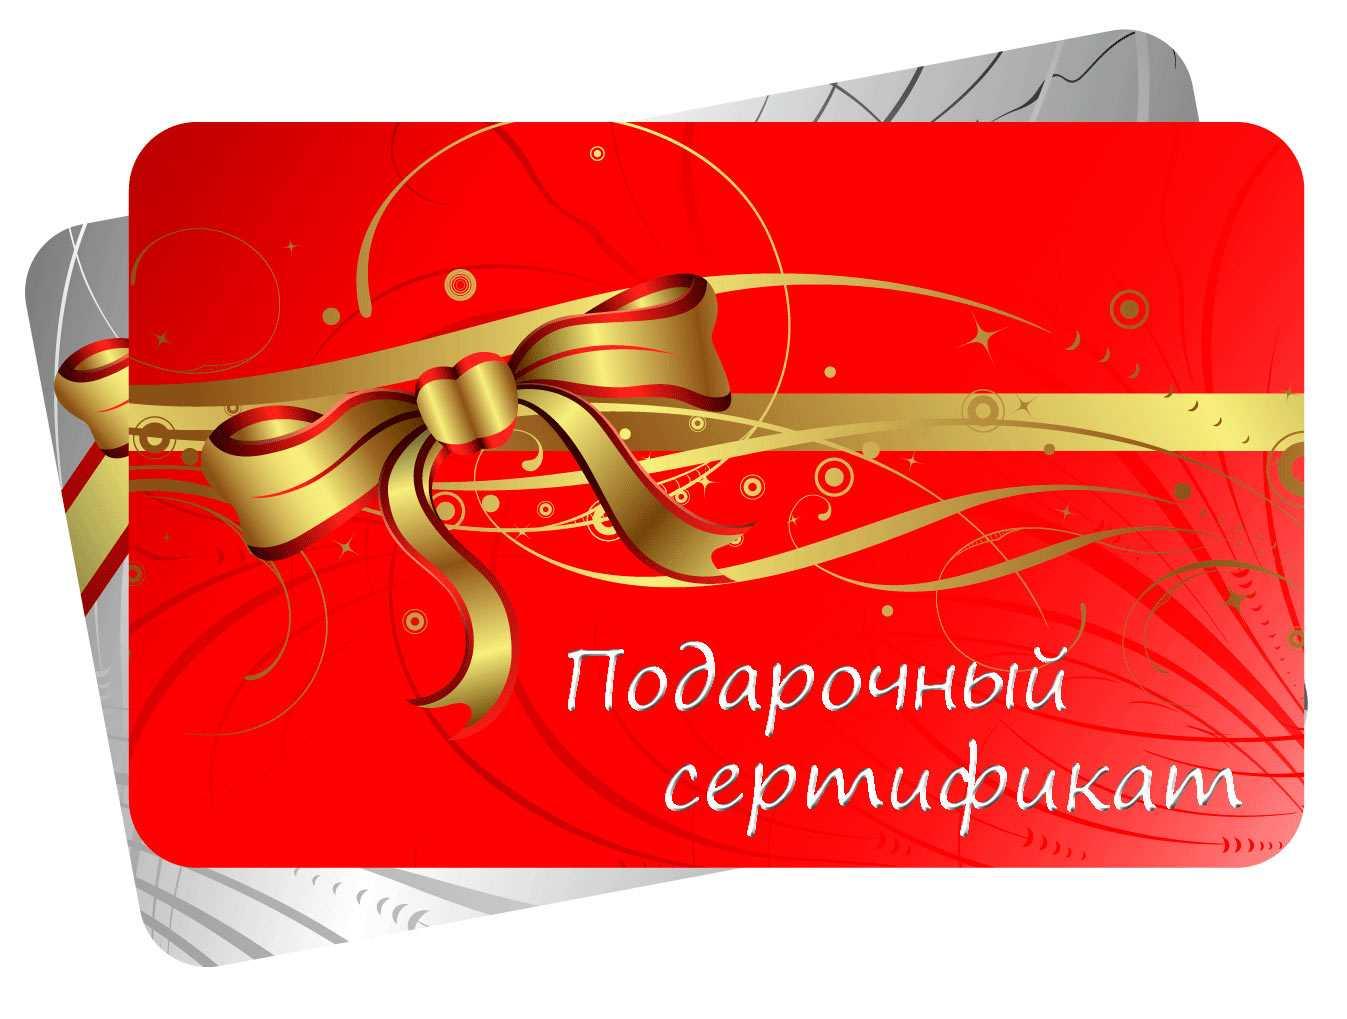 Сертификат в подарок мужчине картинки